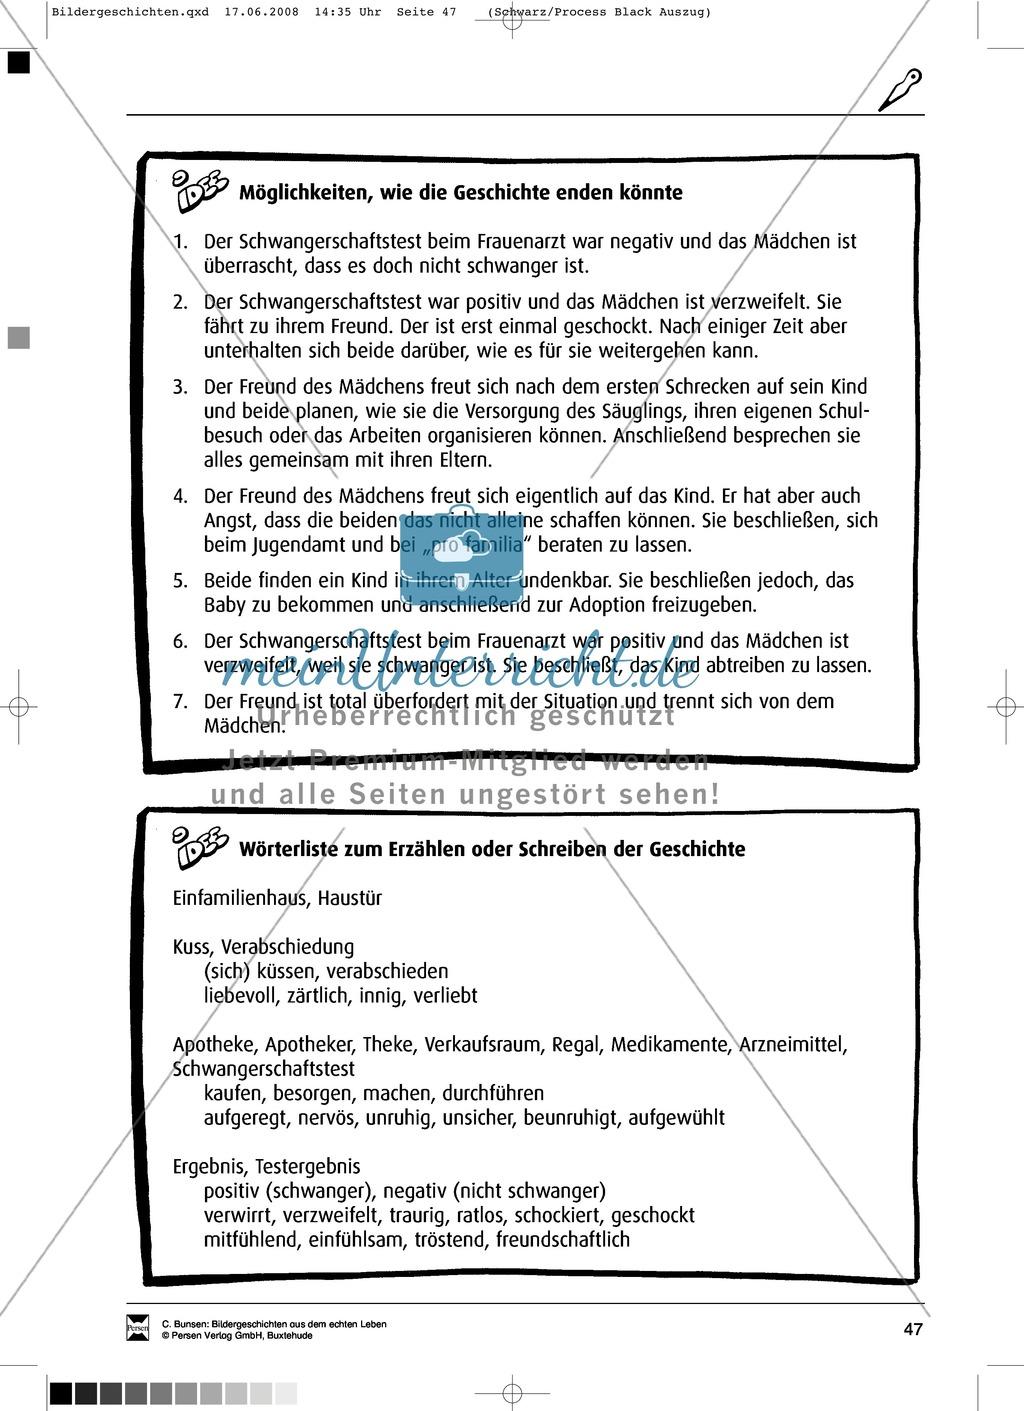 Materialsammlung Teenager-Schwangerschaft: Bilder, Arbeitsblätter und Schmuckblatt Preview 1